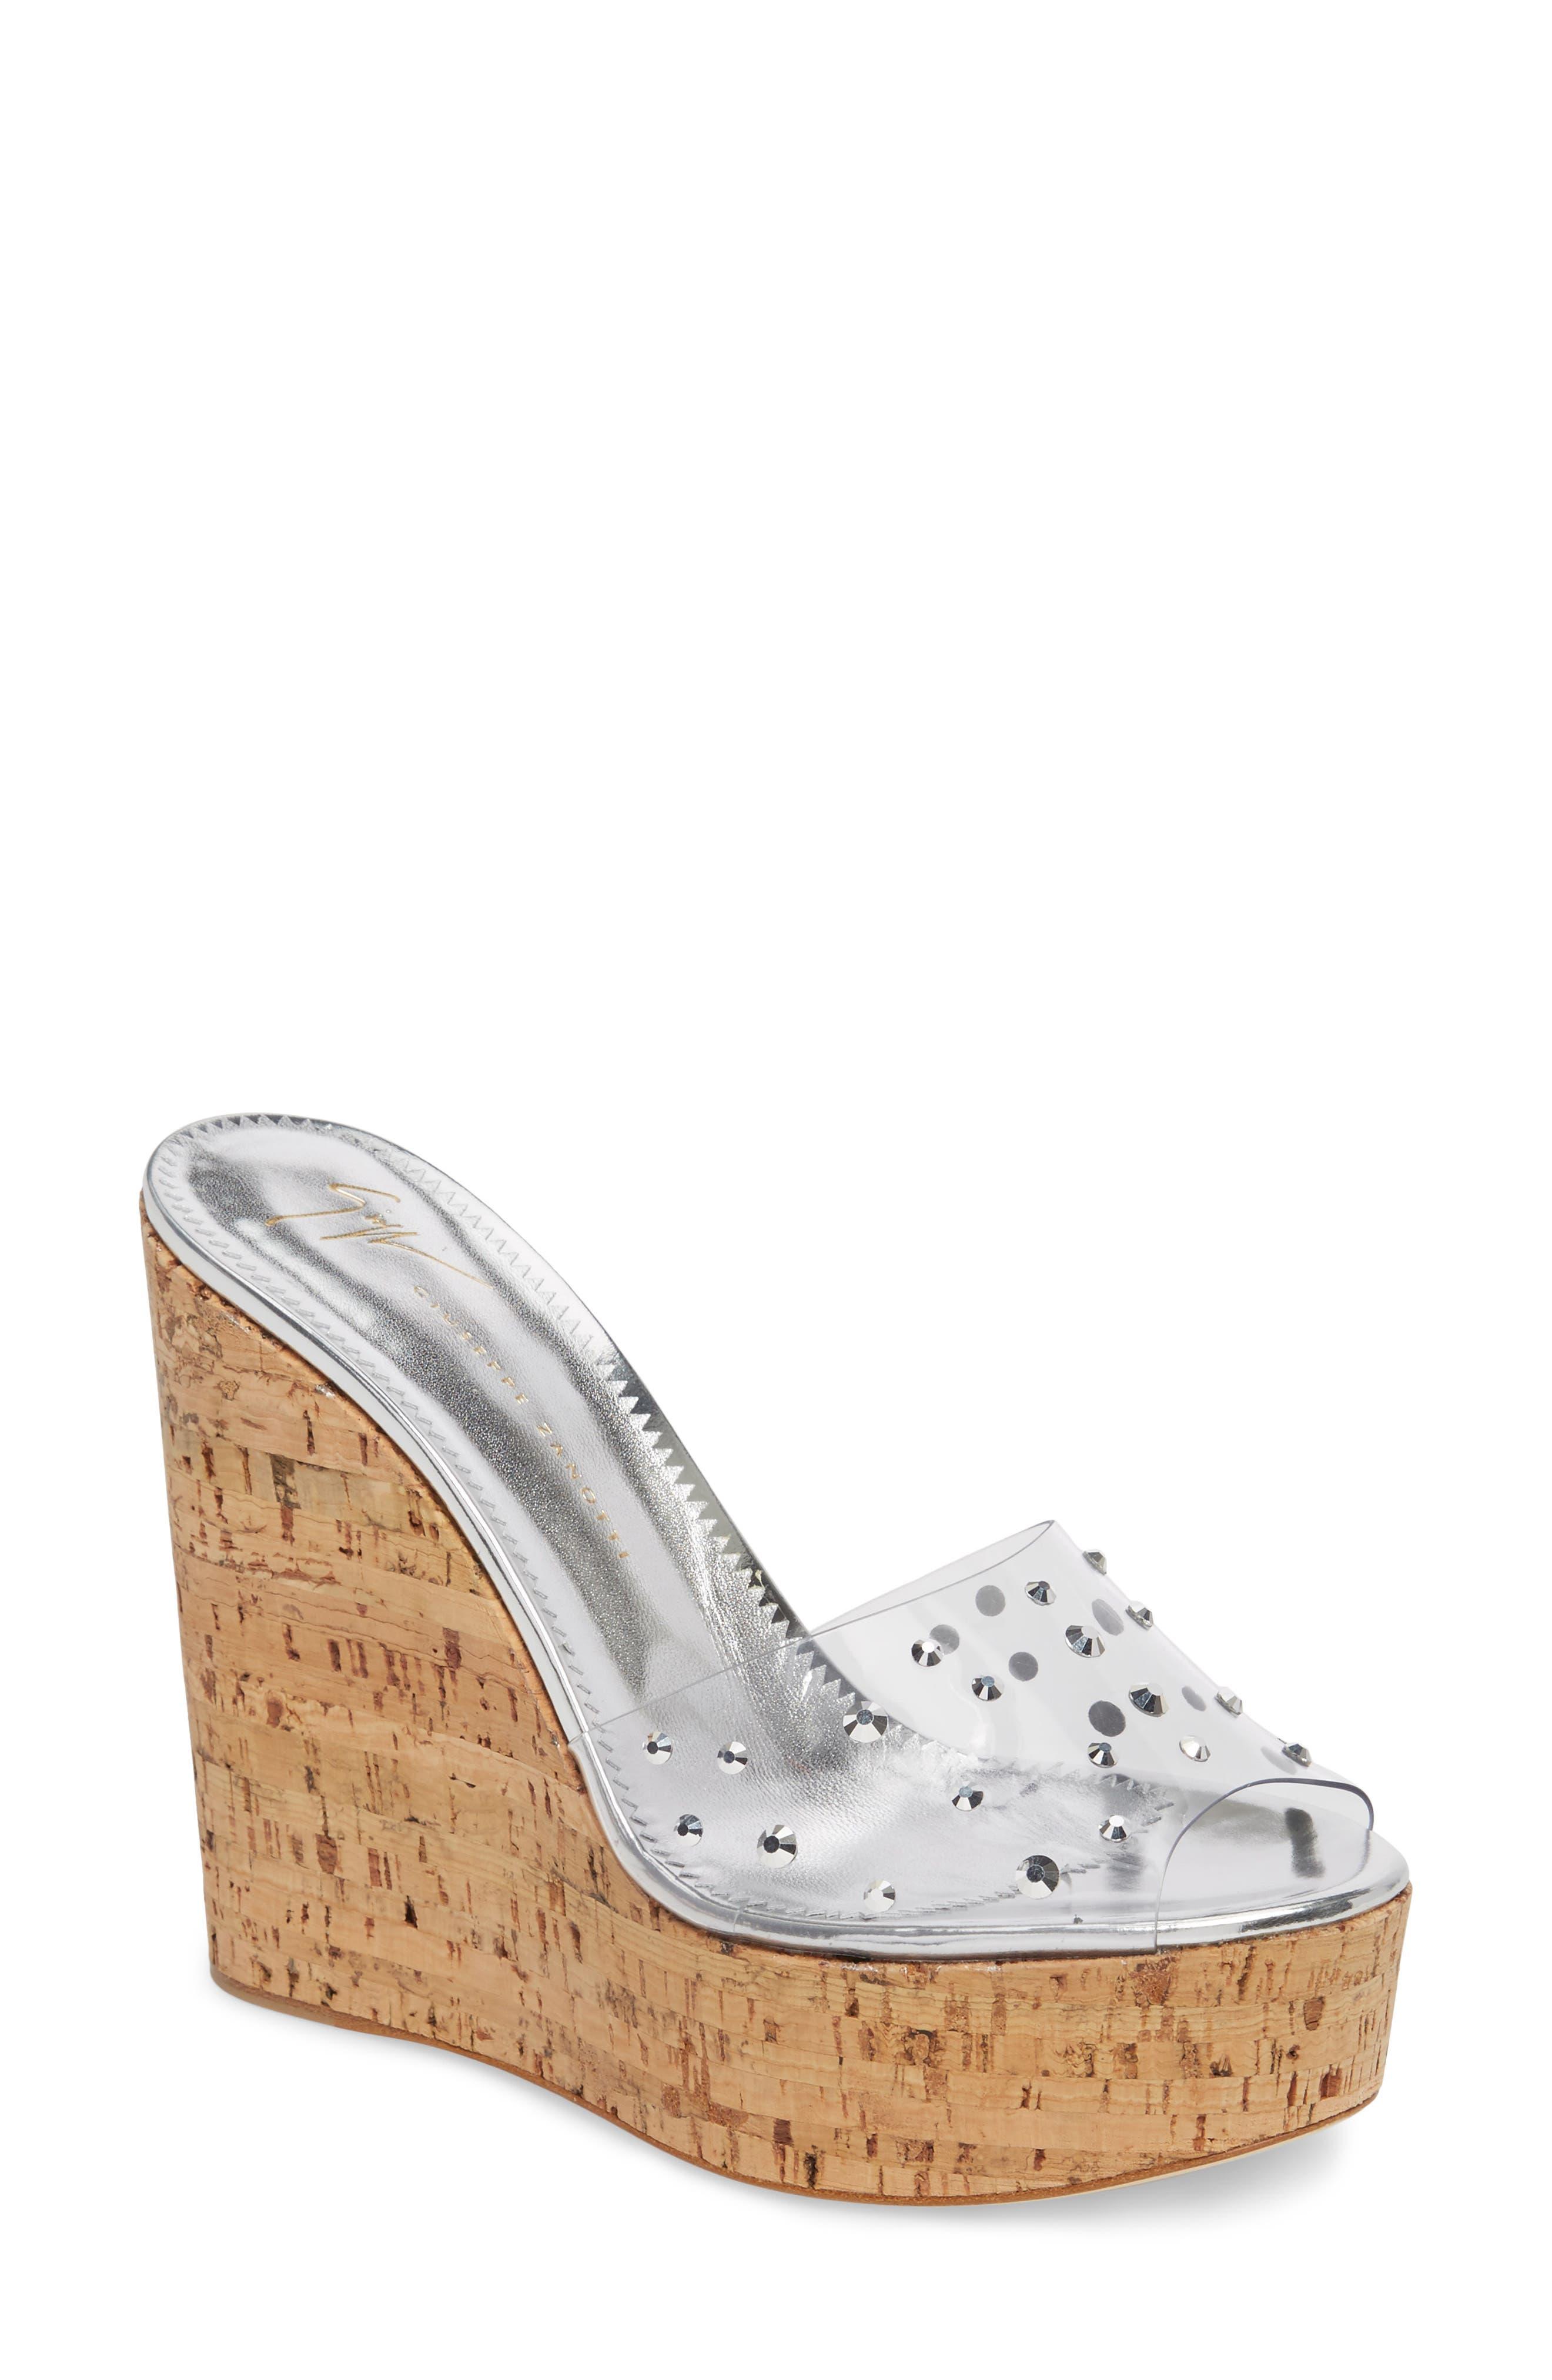 Clear Studded Platform Wedge Sandal,                             Main thumbnail 1, color,                             043